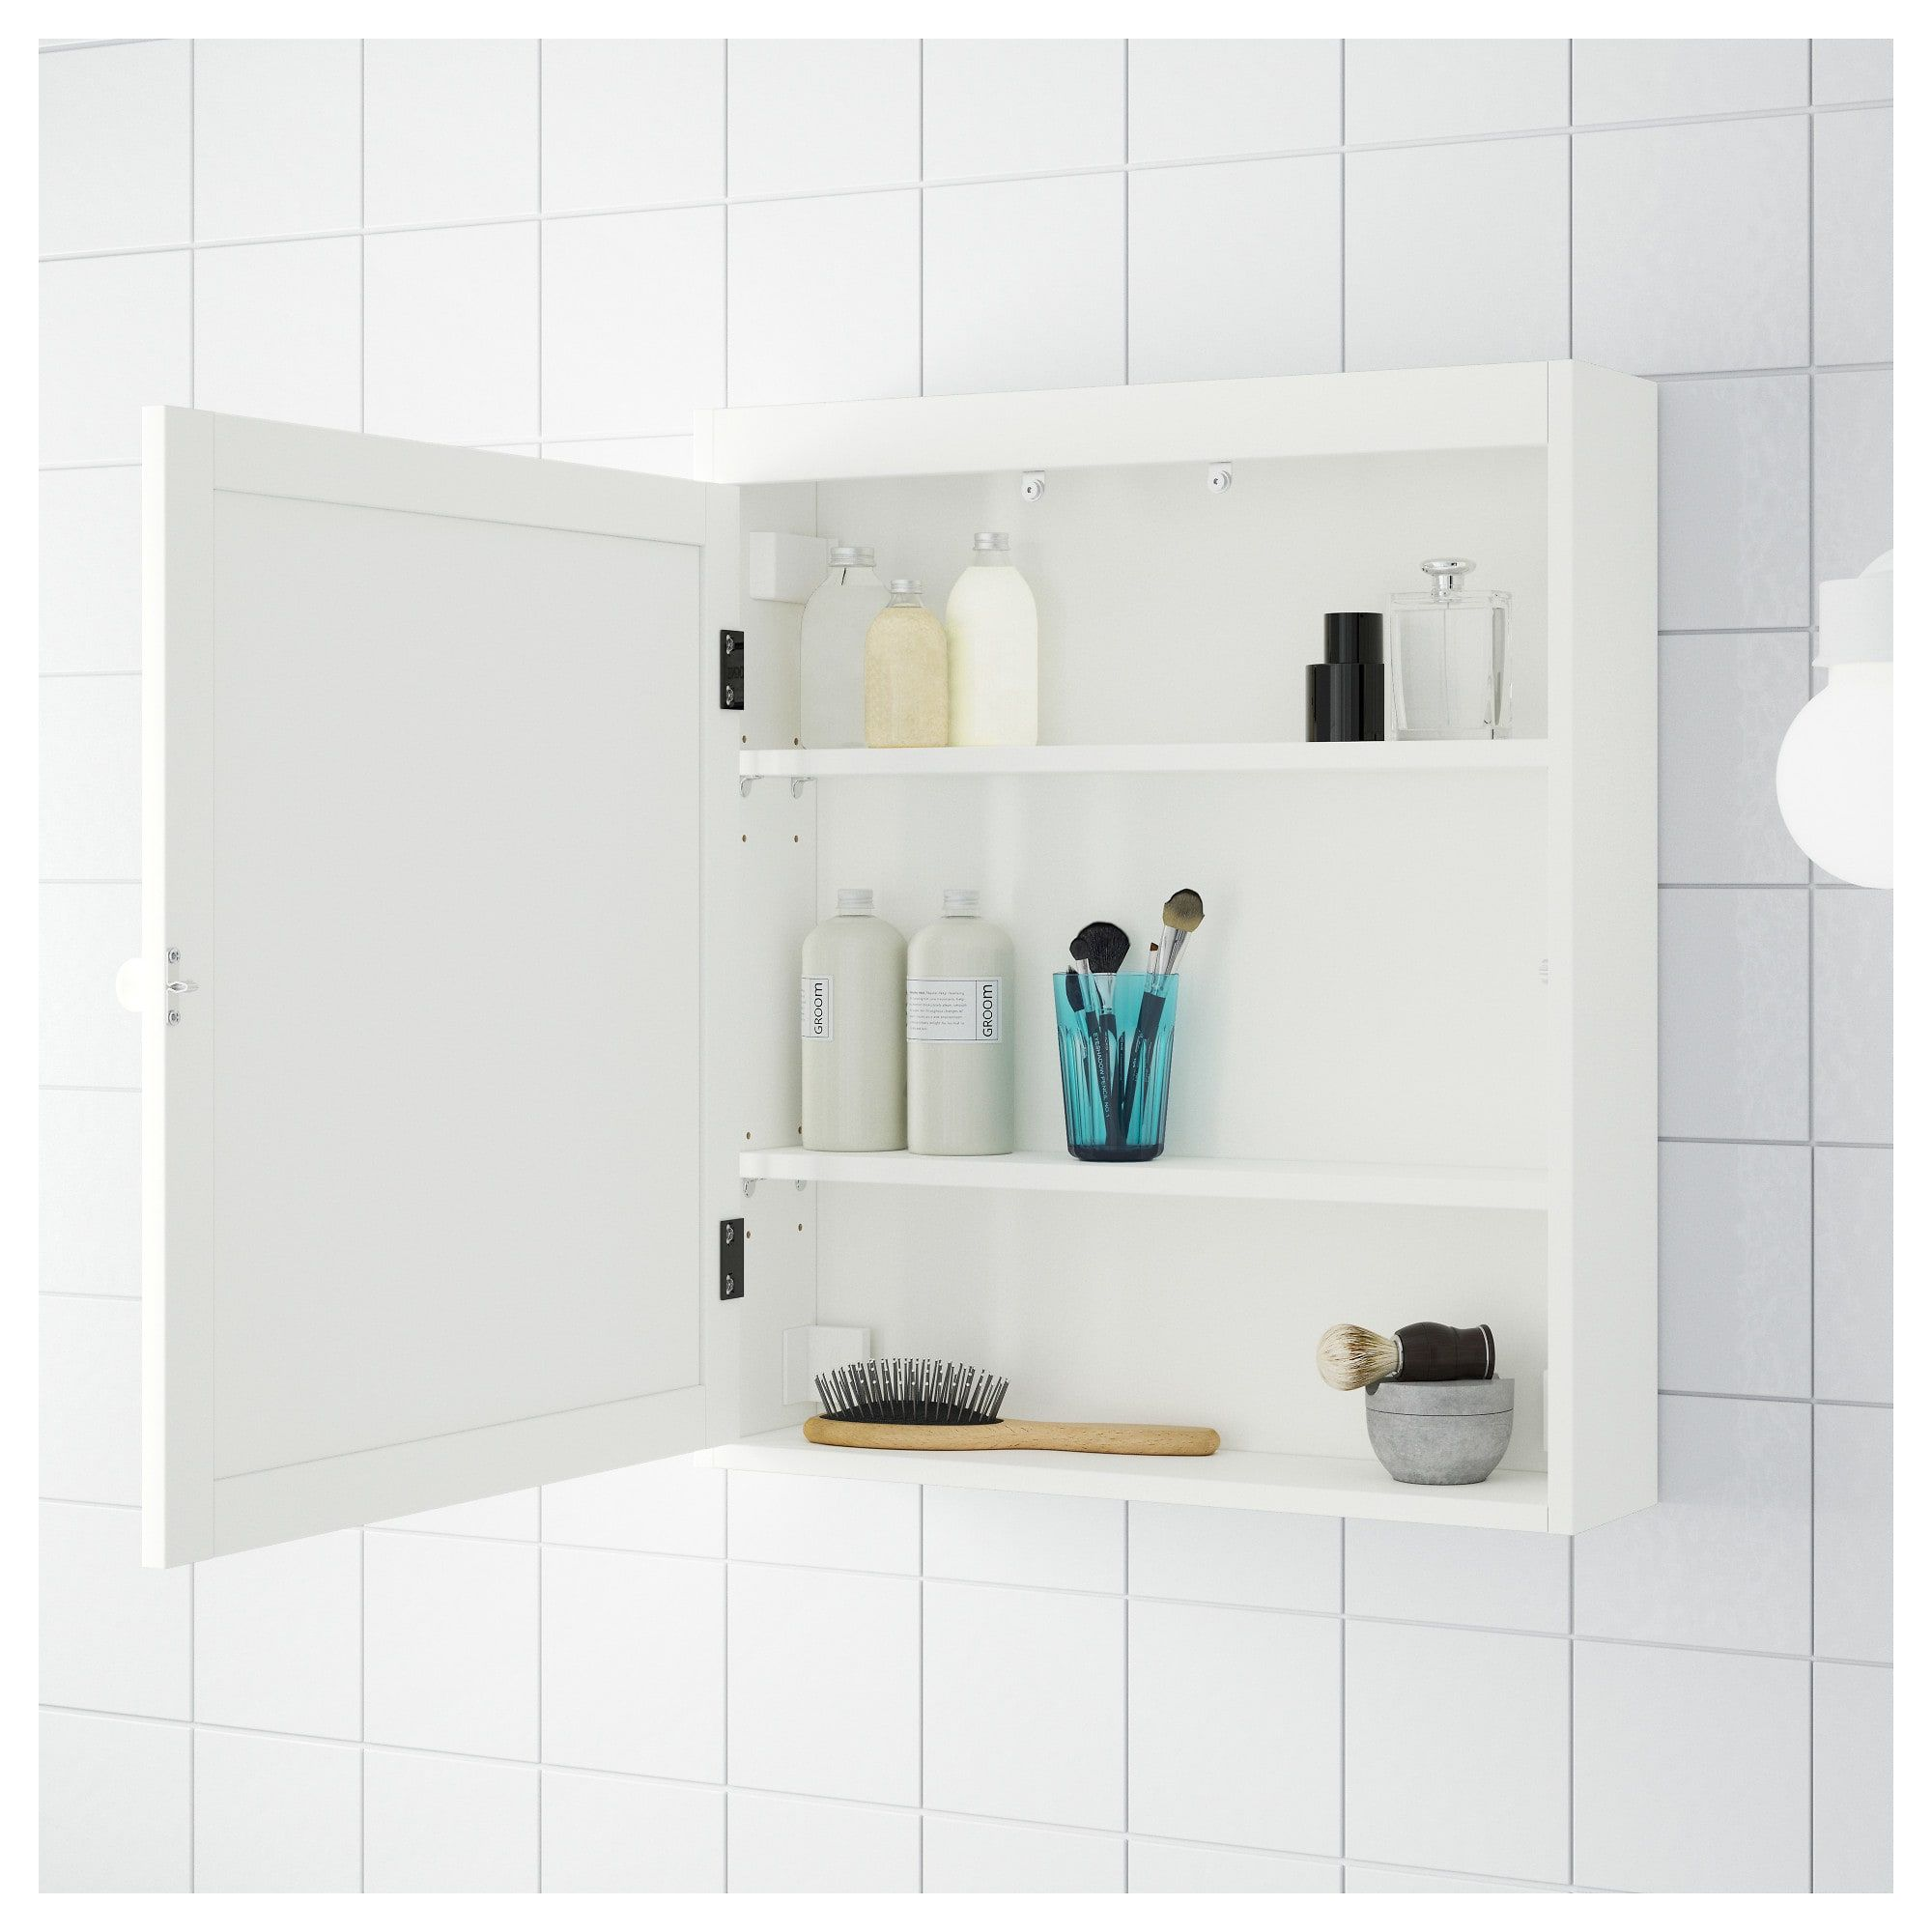 Silveran Mirror Cabinet White 23 5 8x5 1 2x26 7 8 Ikea Mirror Cabinets Bathroom Mirror Cabinet Ikea Silveran